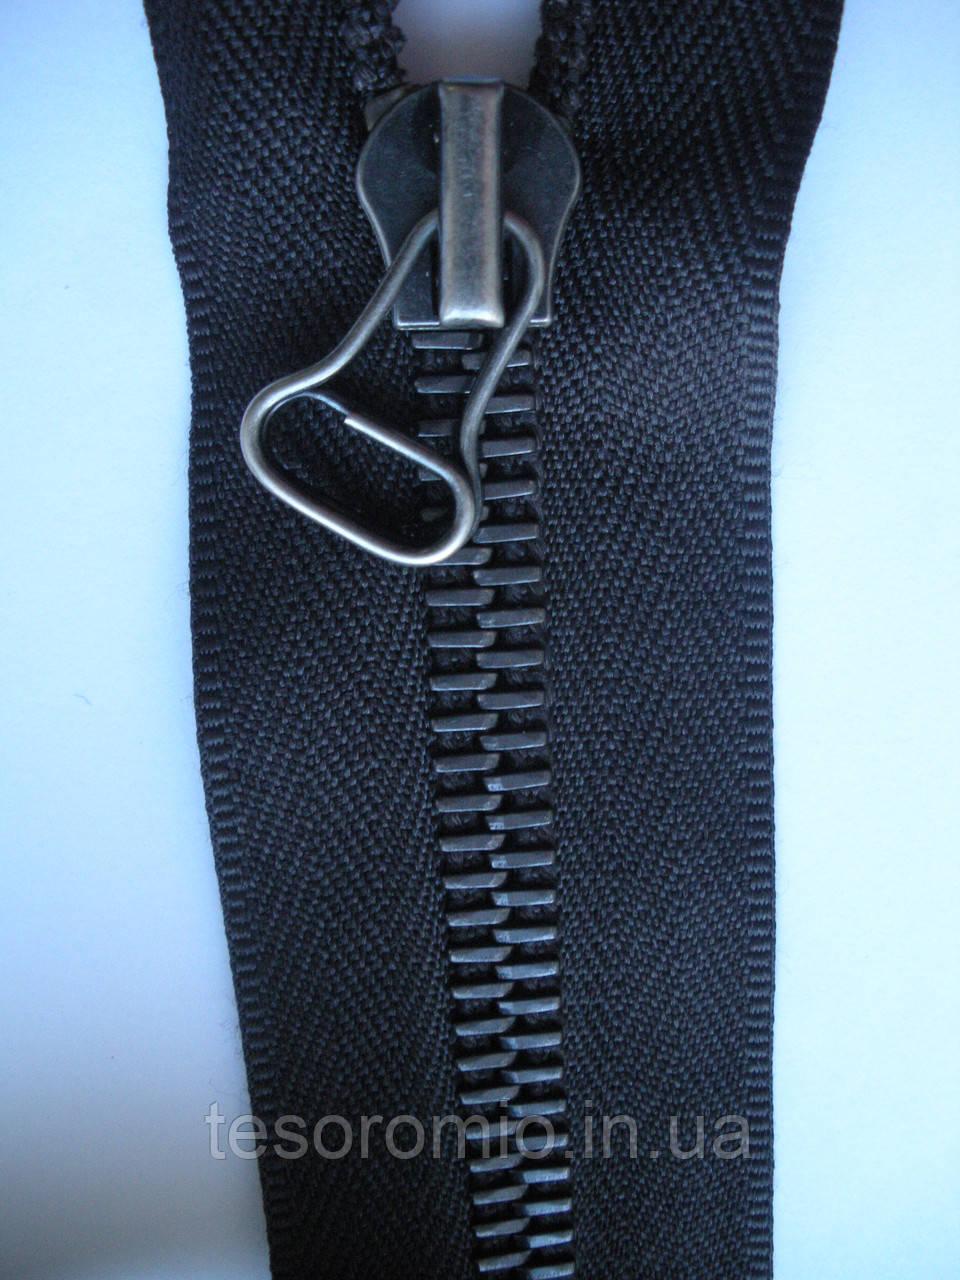 Блискавка металева riri 68см сіра тасьма чорнене ланка, тип 8